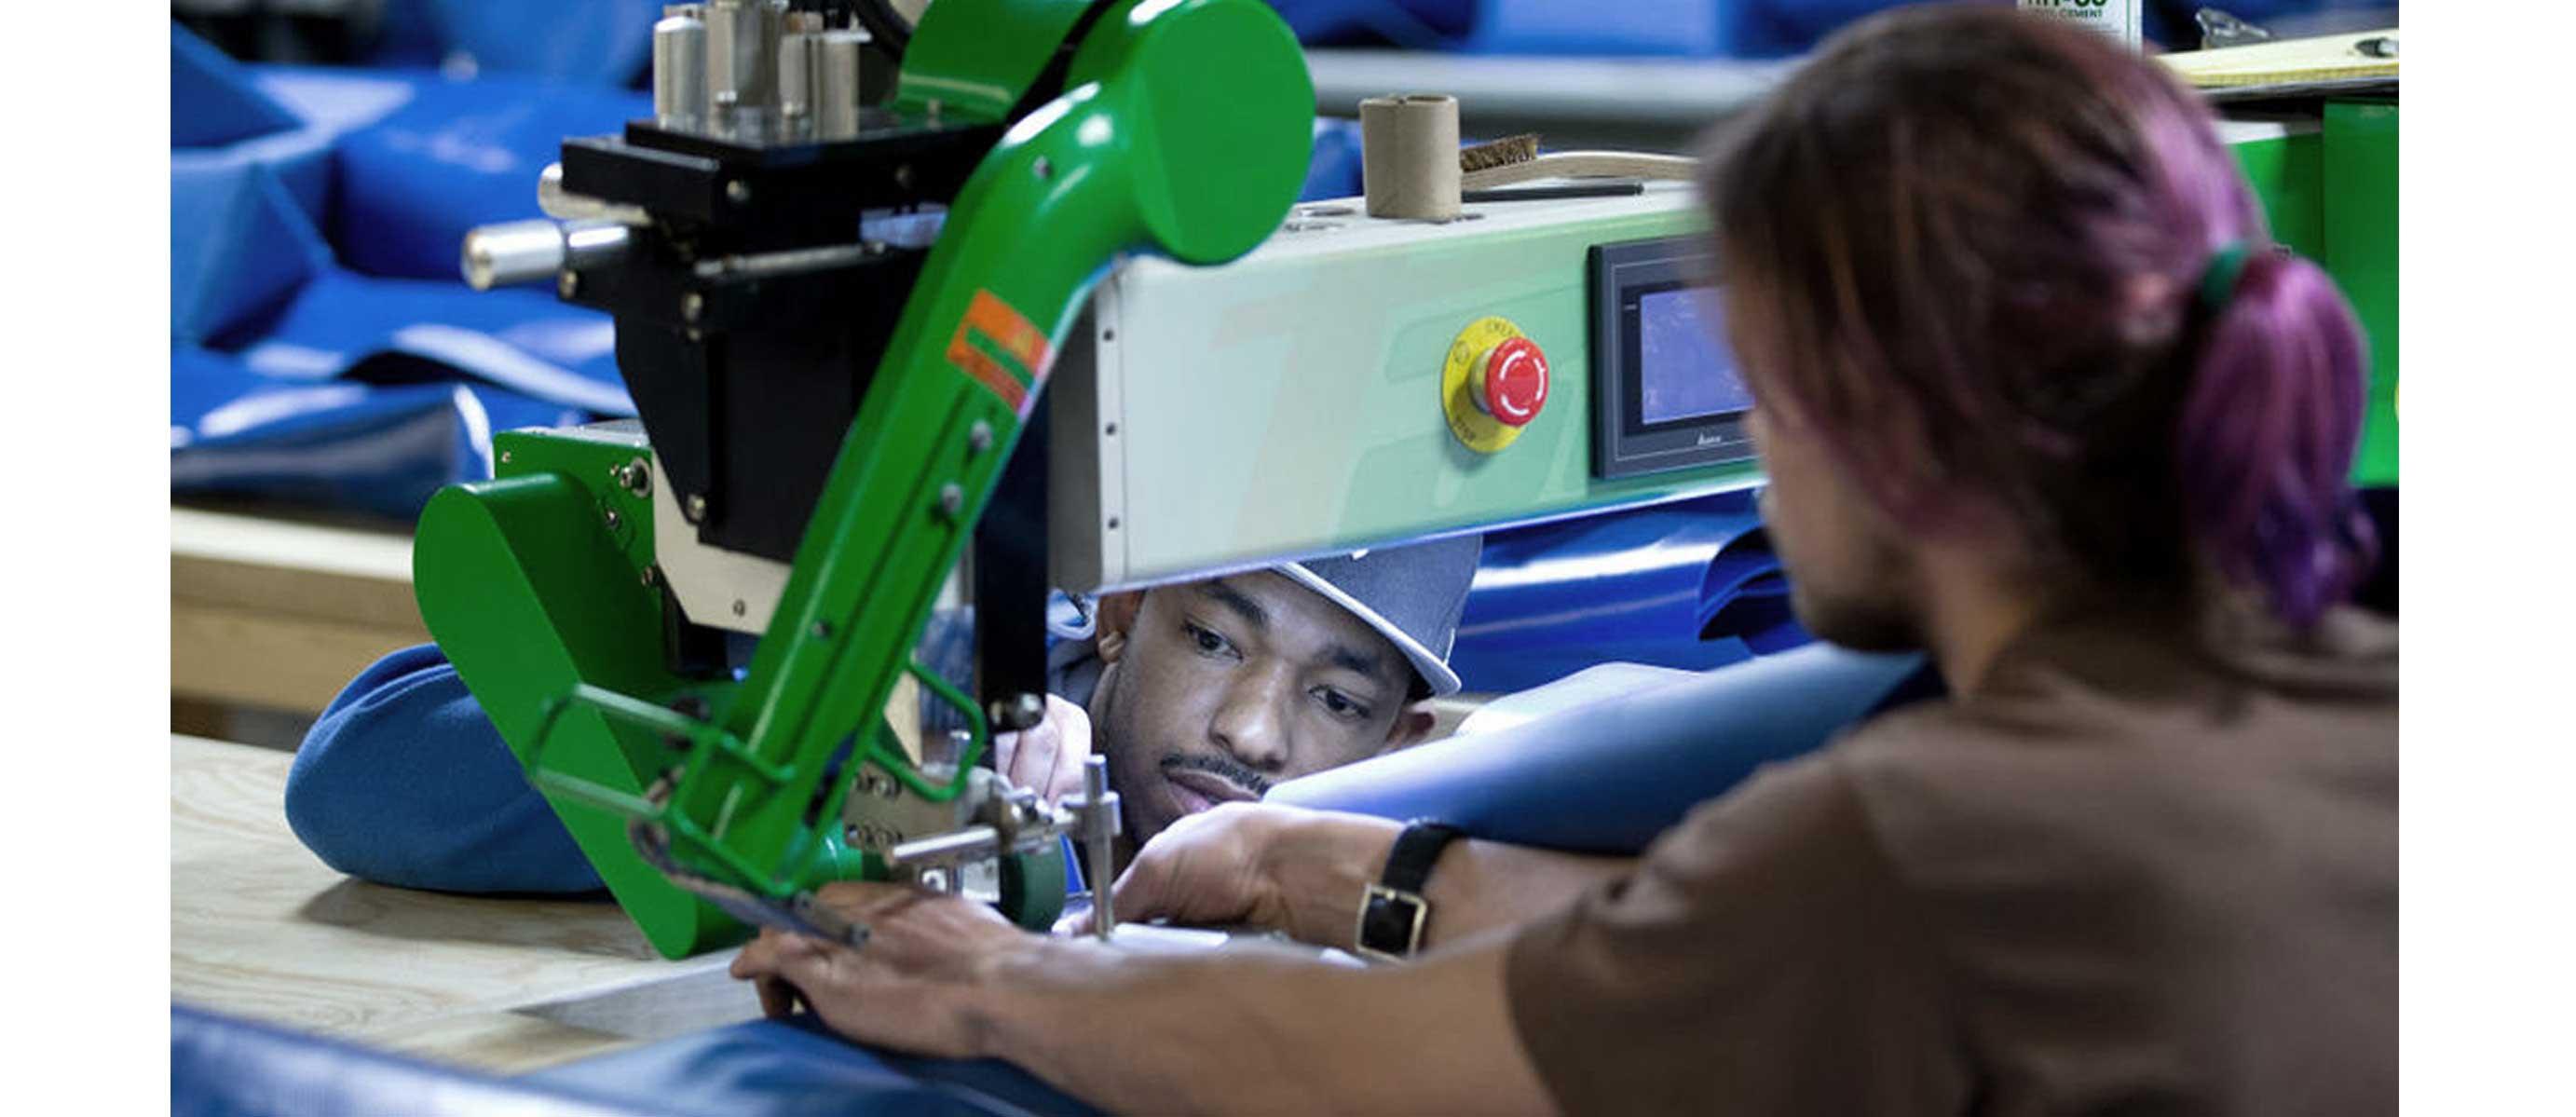 kool shield manufacturing process